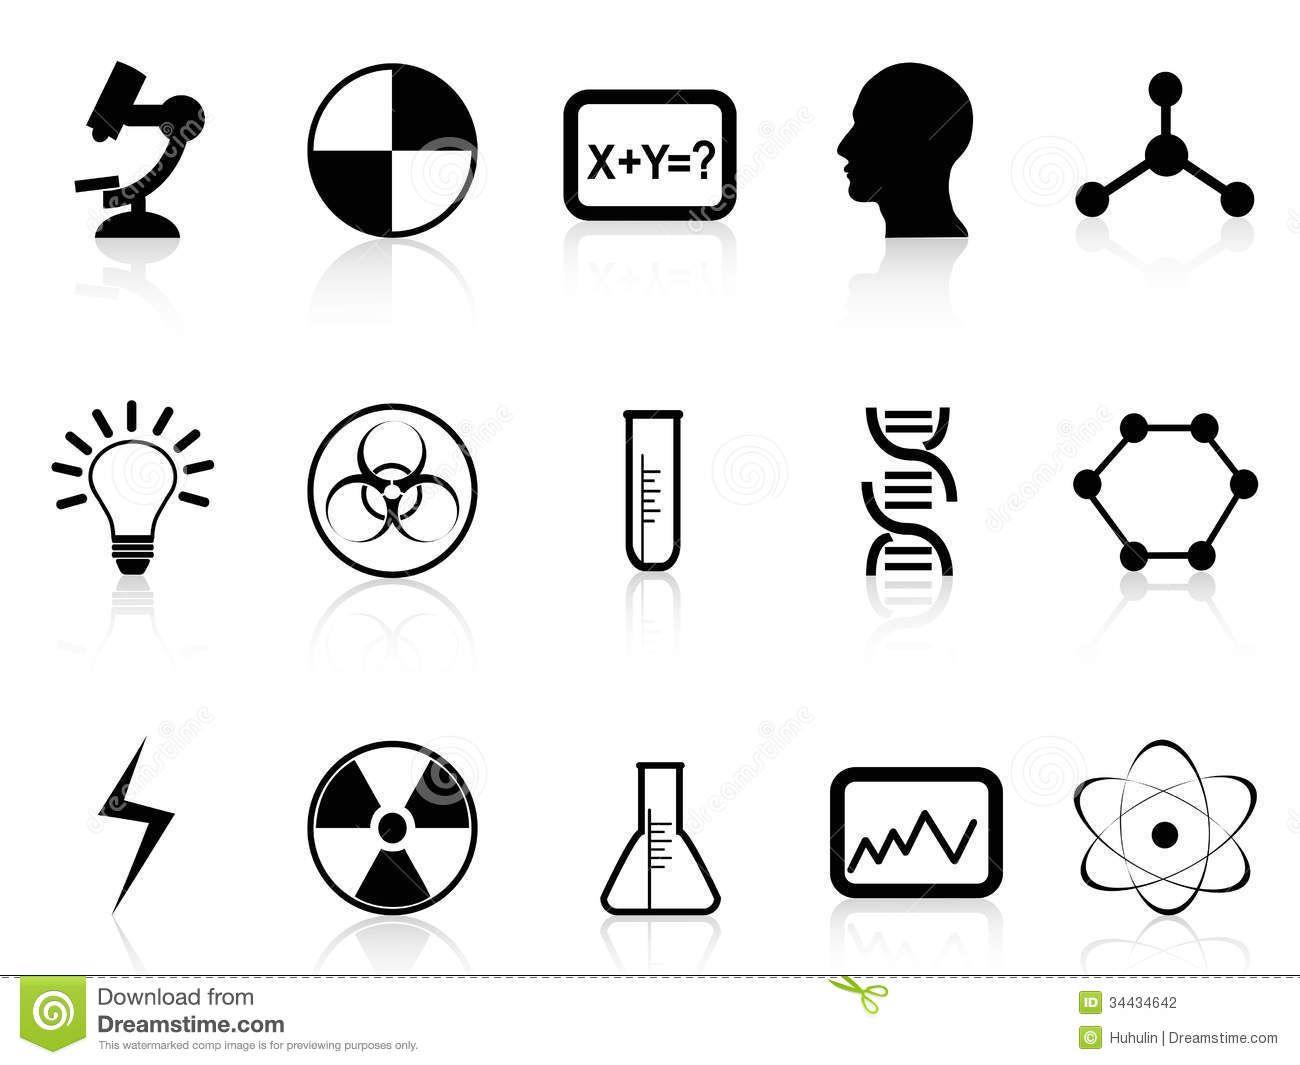 Thumbs Dreamstime Z Black Science Symbols White